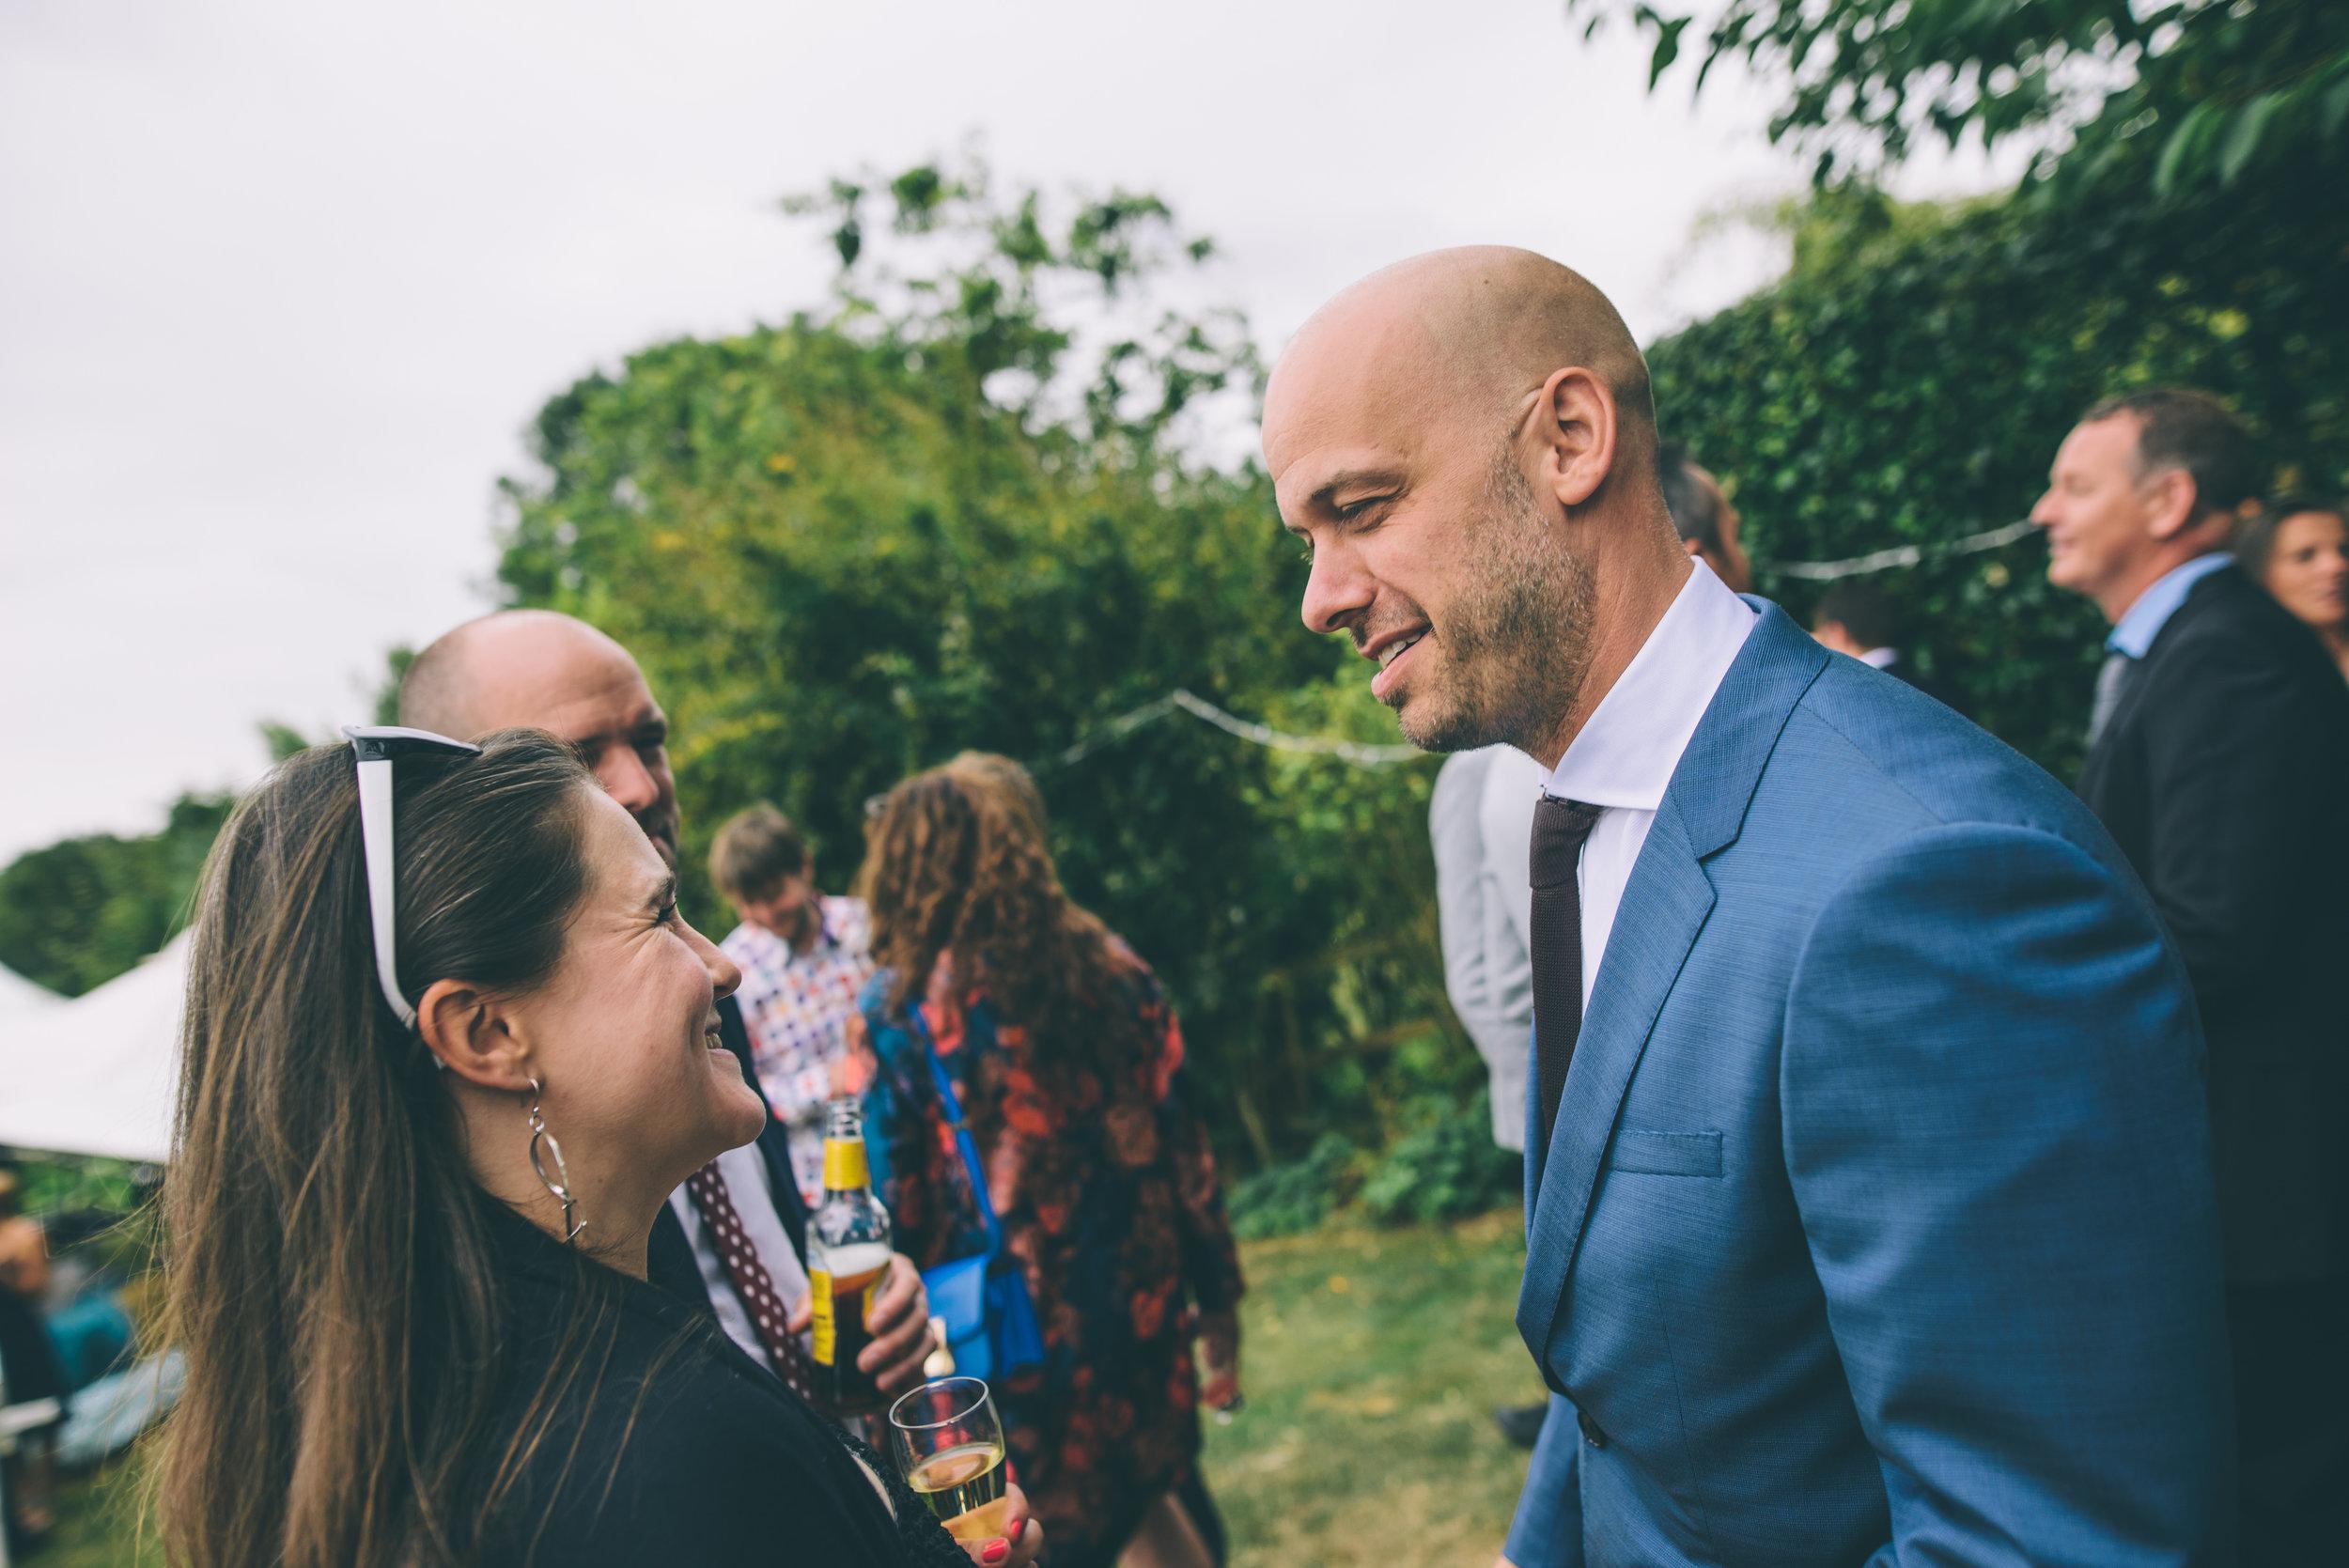 Garden Wedding photography Barley Herefordshire - Tracy + Matt -266.jpg